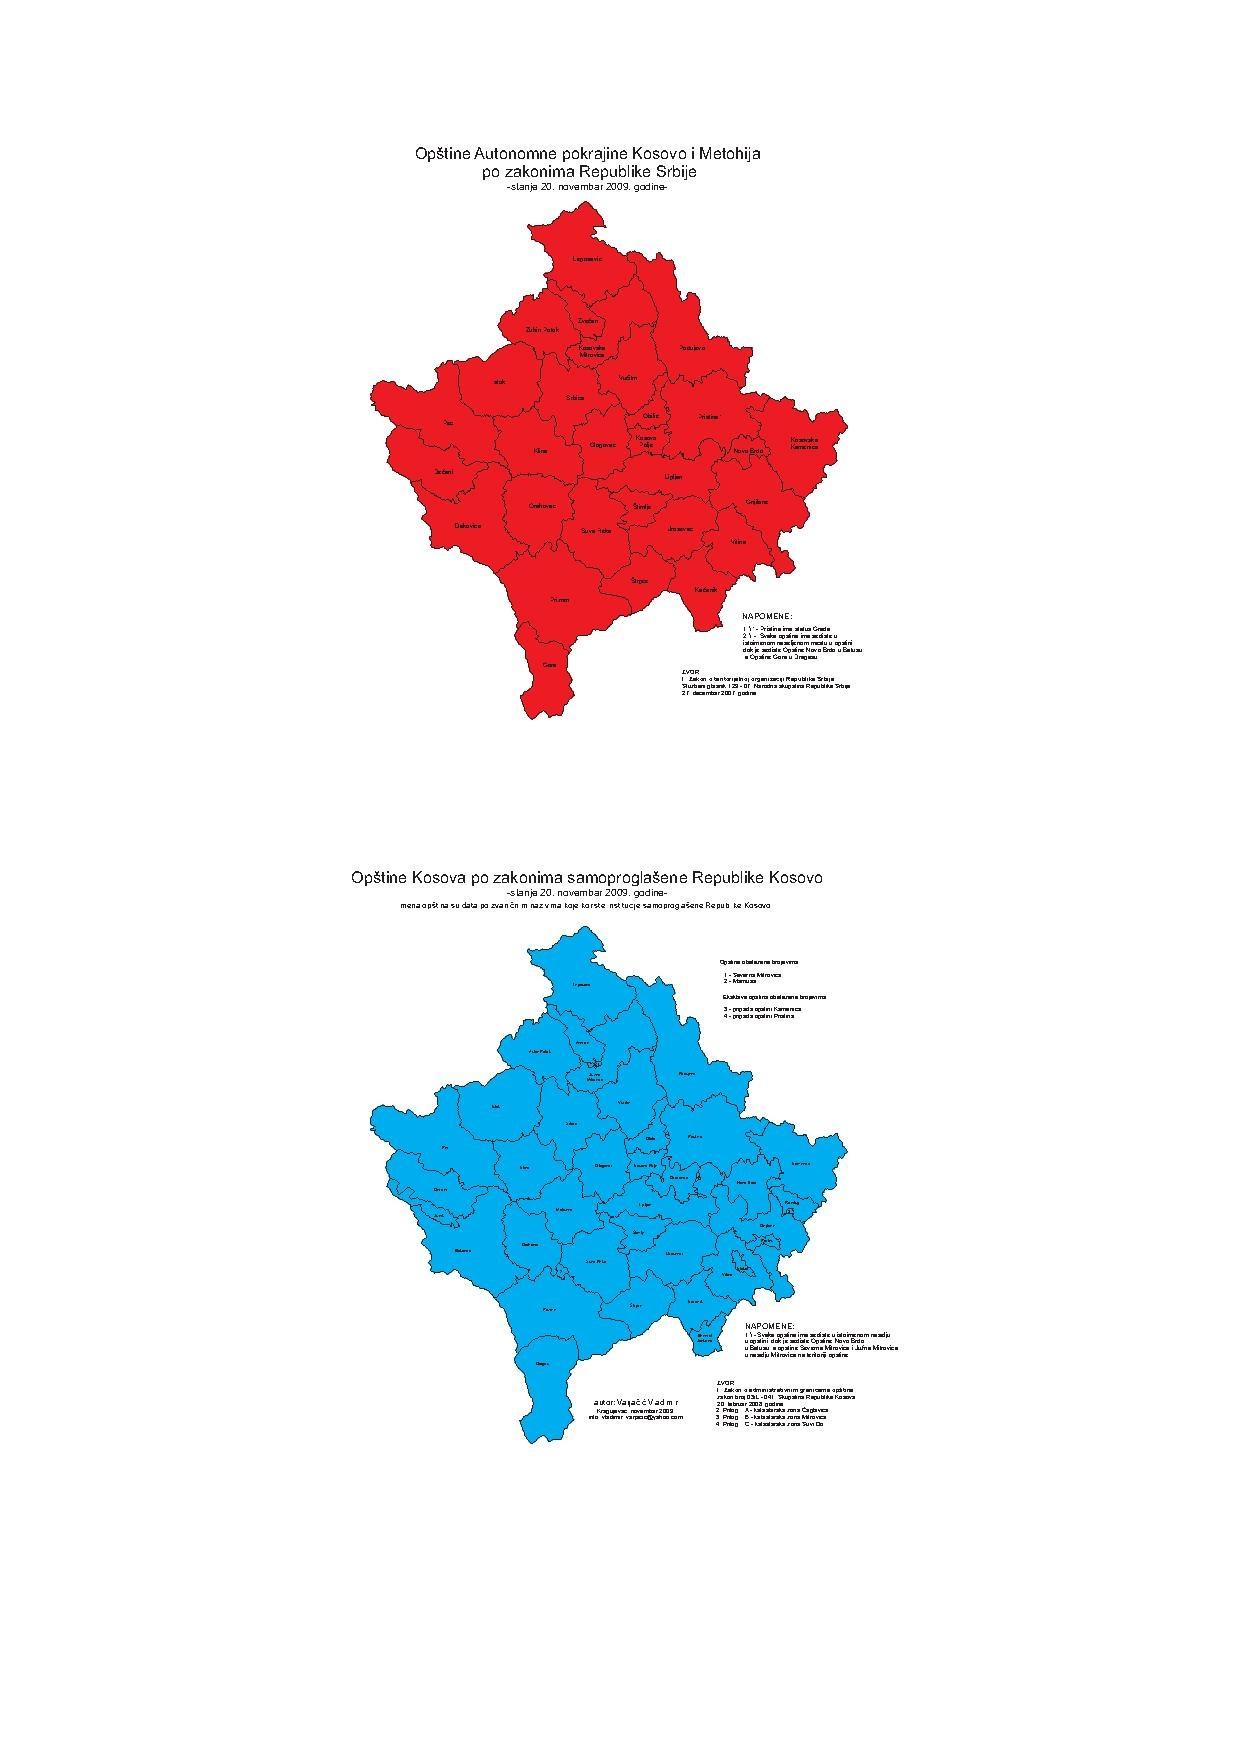 FileKosovo I Metohija And Republika Kosovopdf Wikimedia Commons - Kosovo map hd pdf